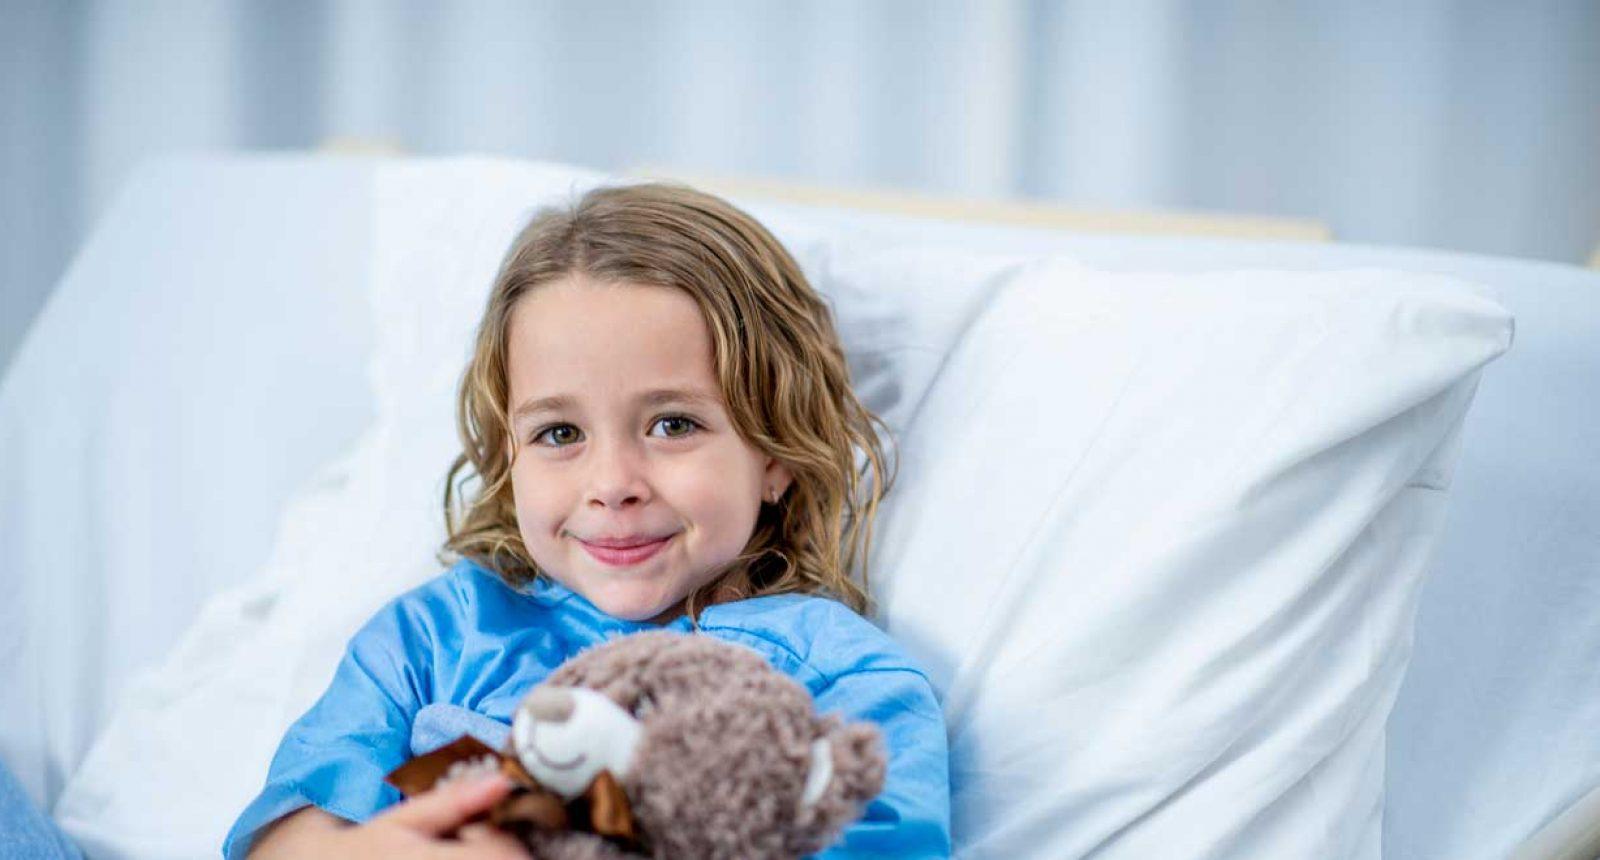 Jente i sykeseng med bamse